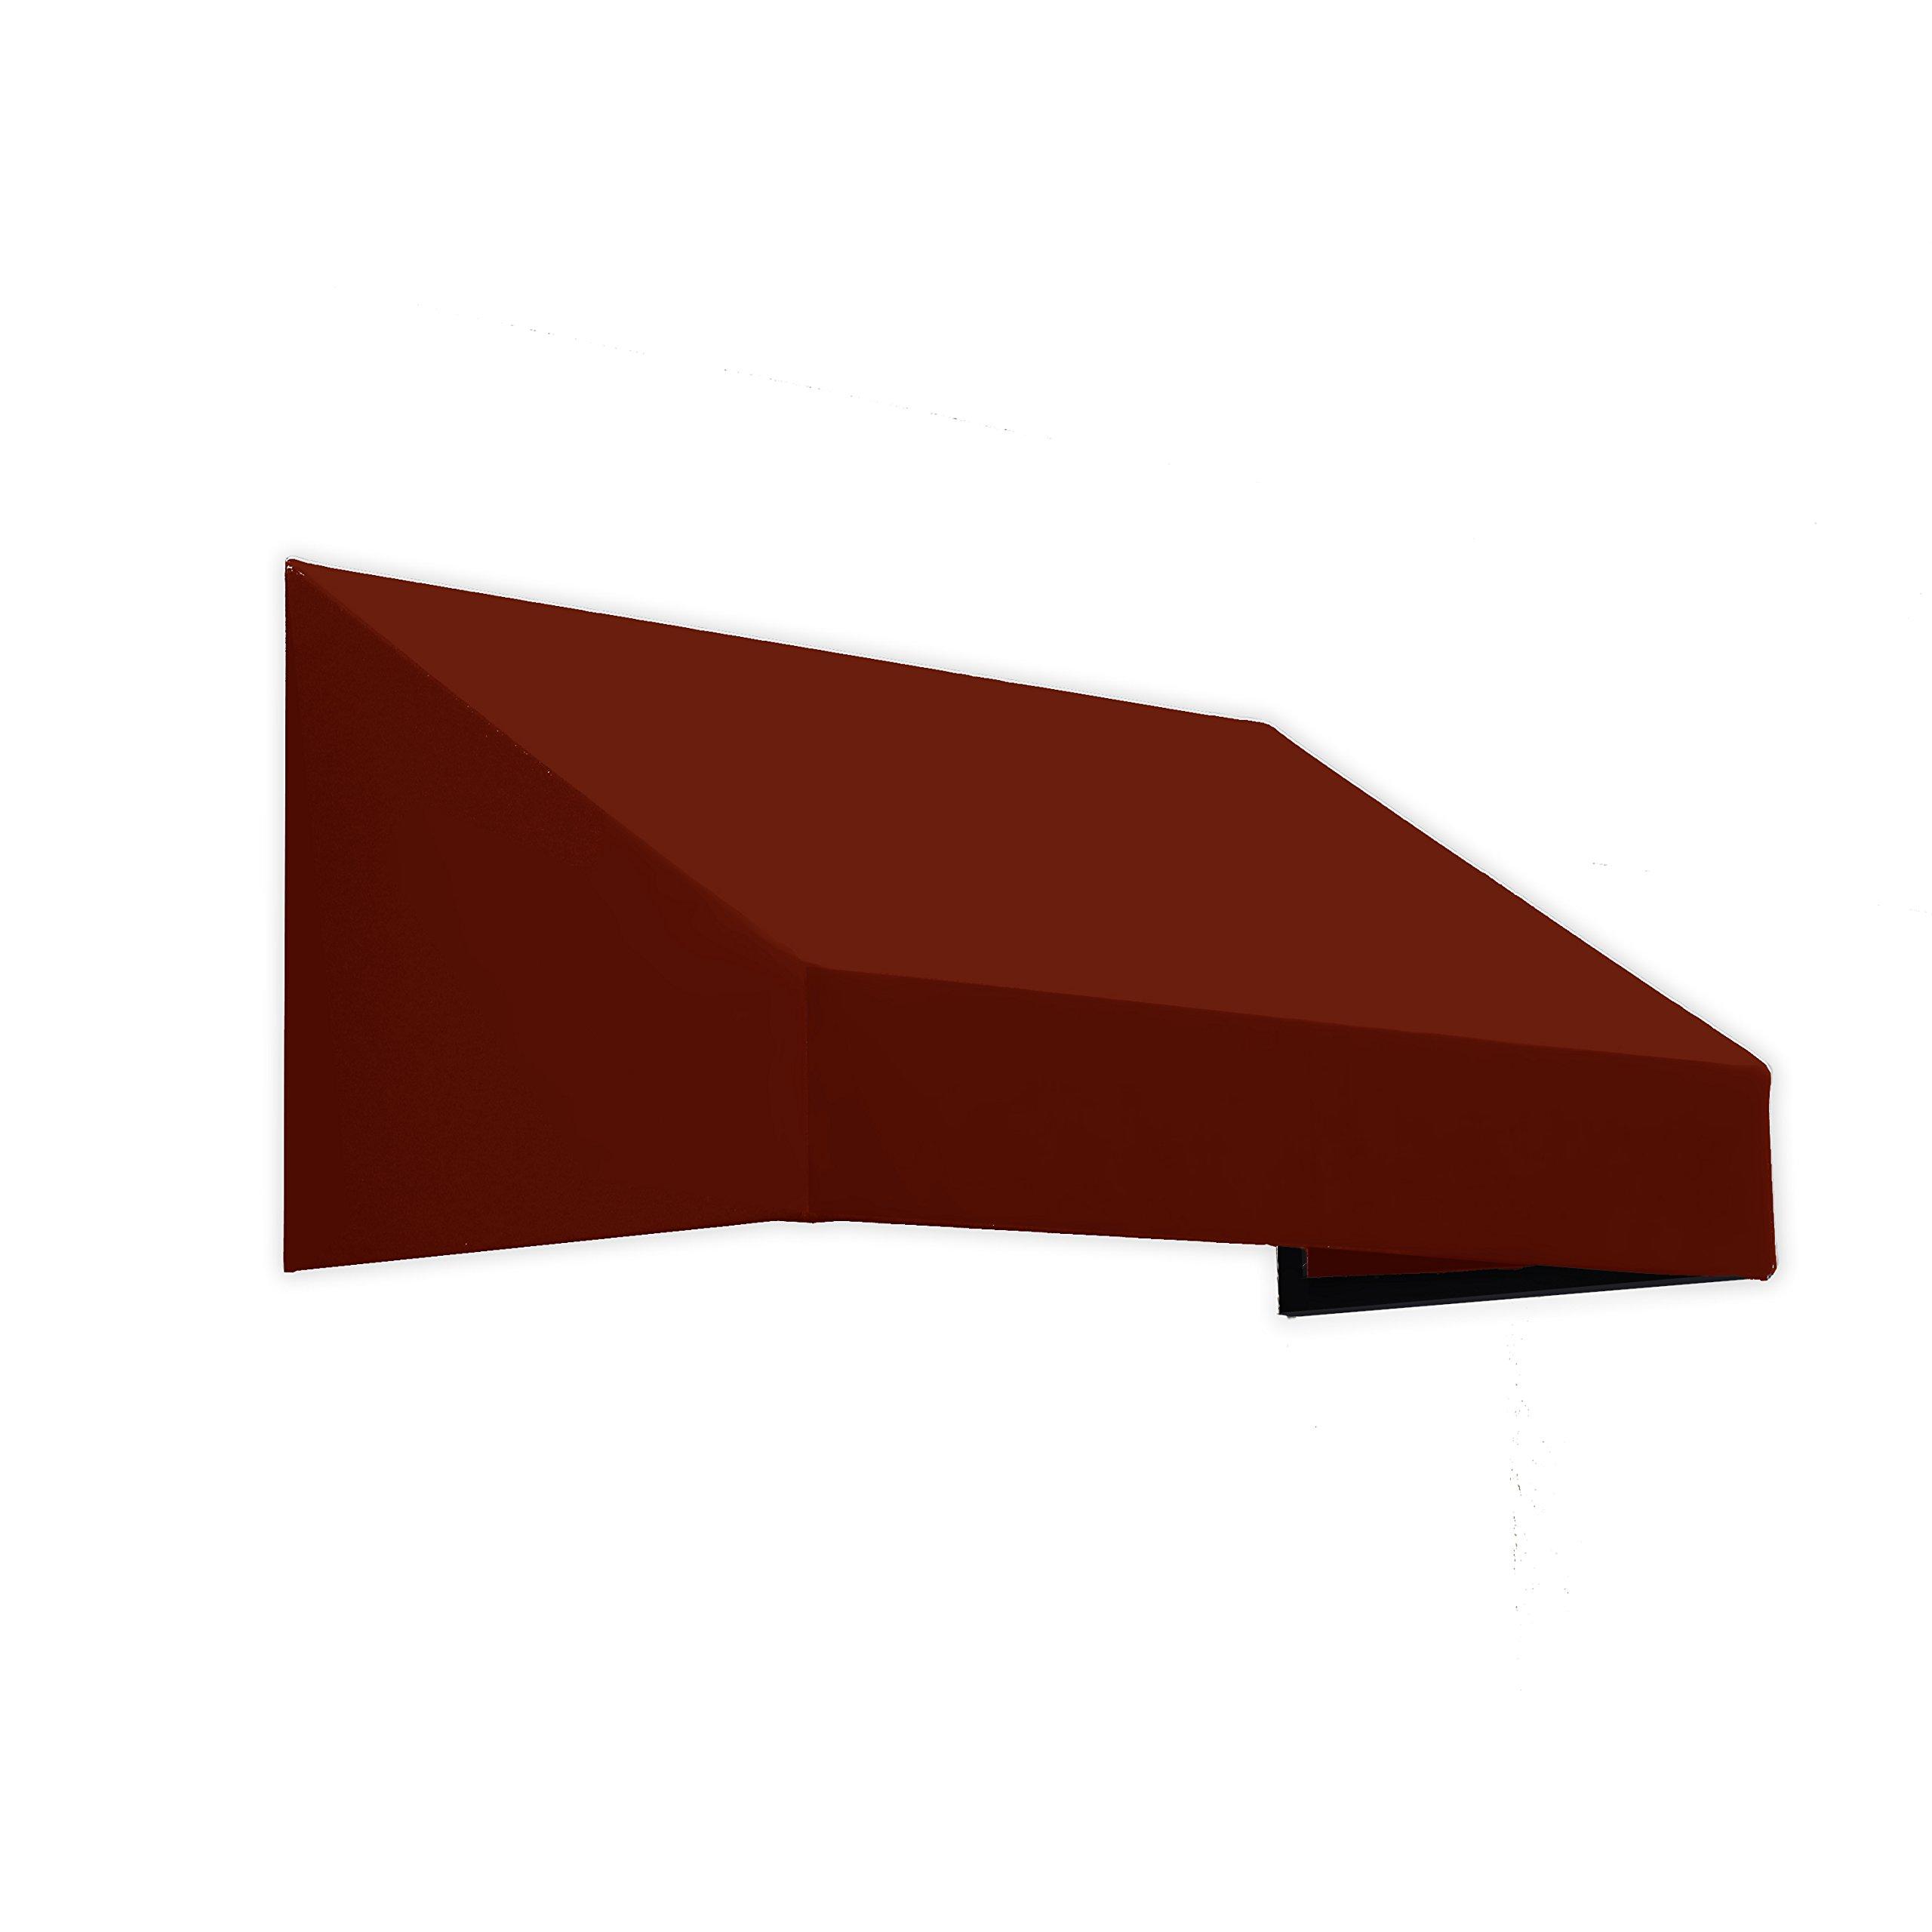 Awntech 4-Feet New Yorker Window/Entry Awning, 18-Inch Height by 36-Inch Diameter, Terra Cotta